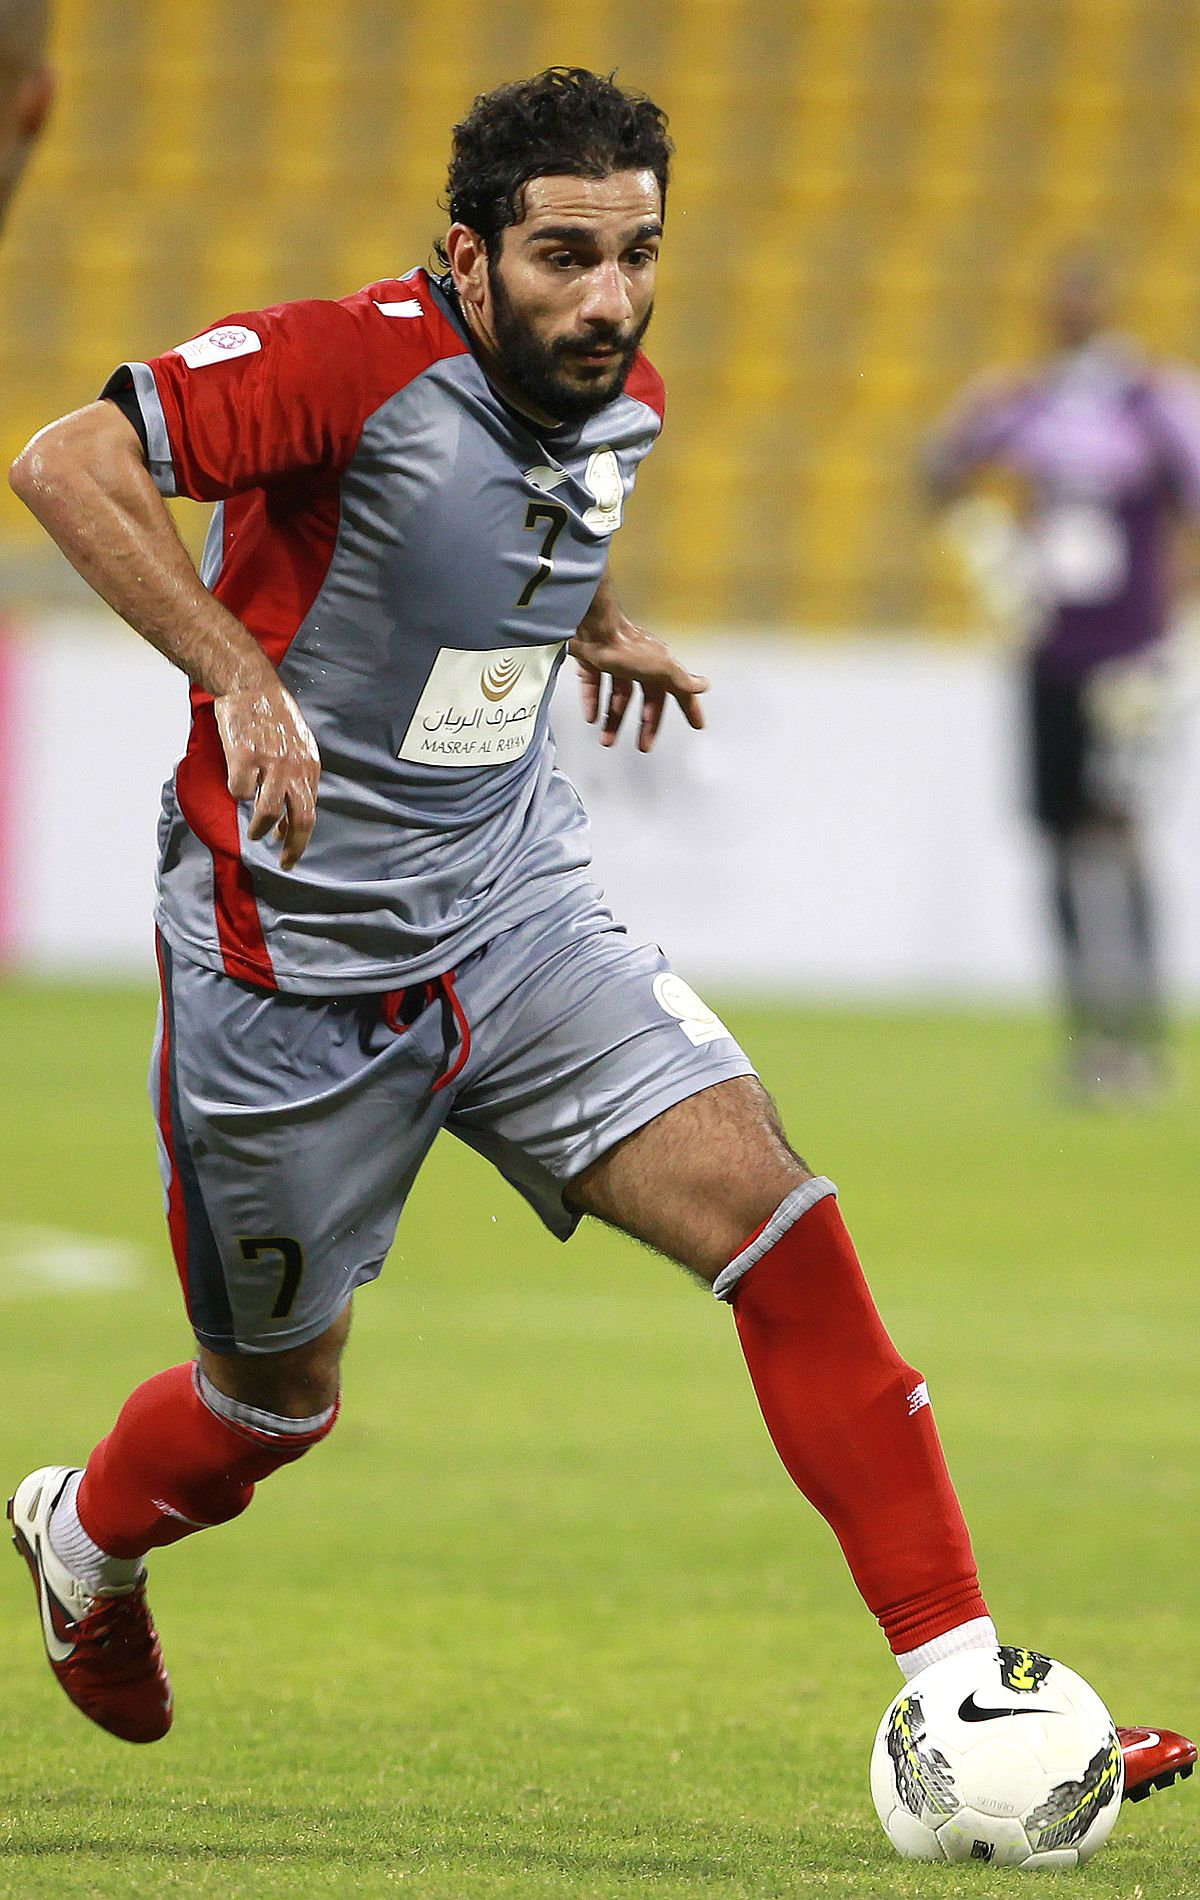 Adel Lami - Wikipedia